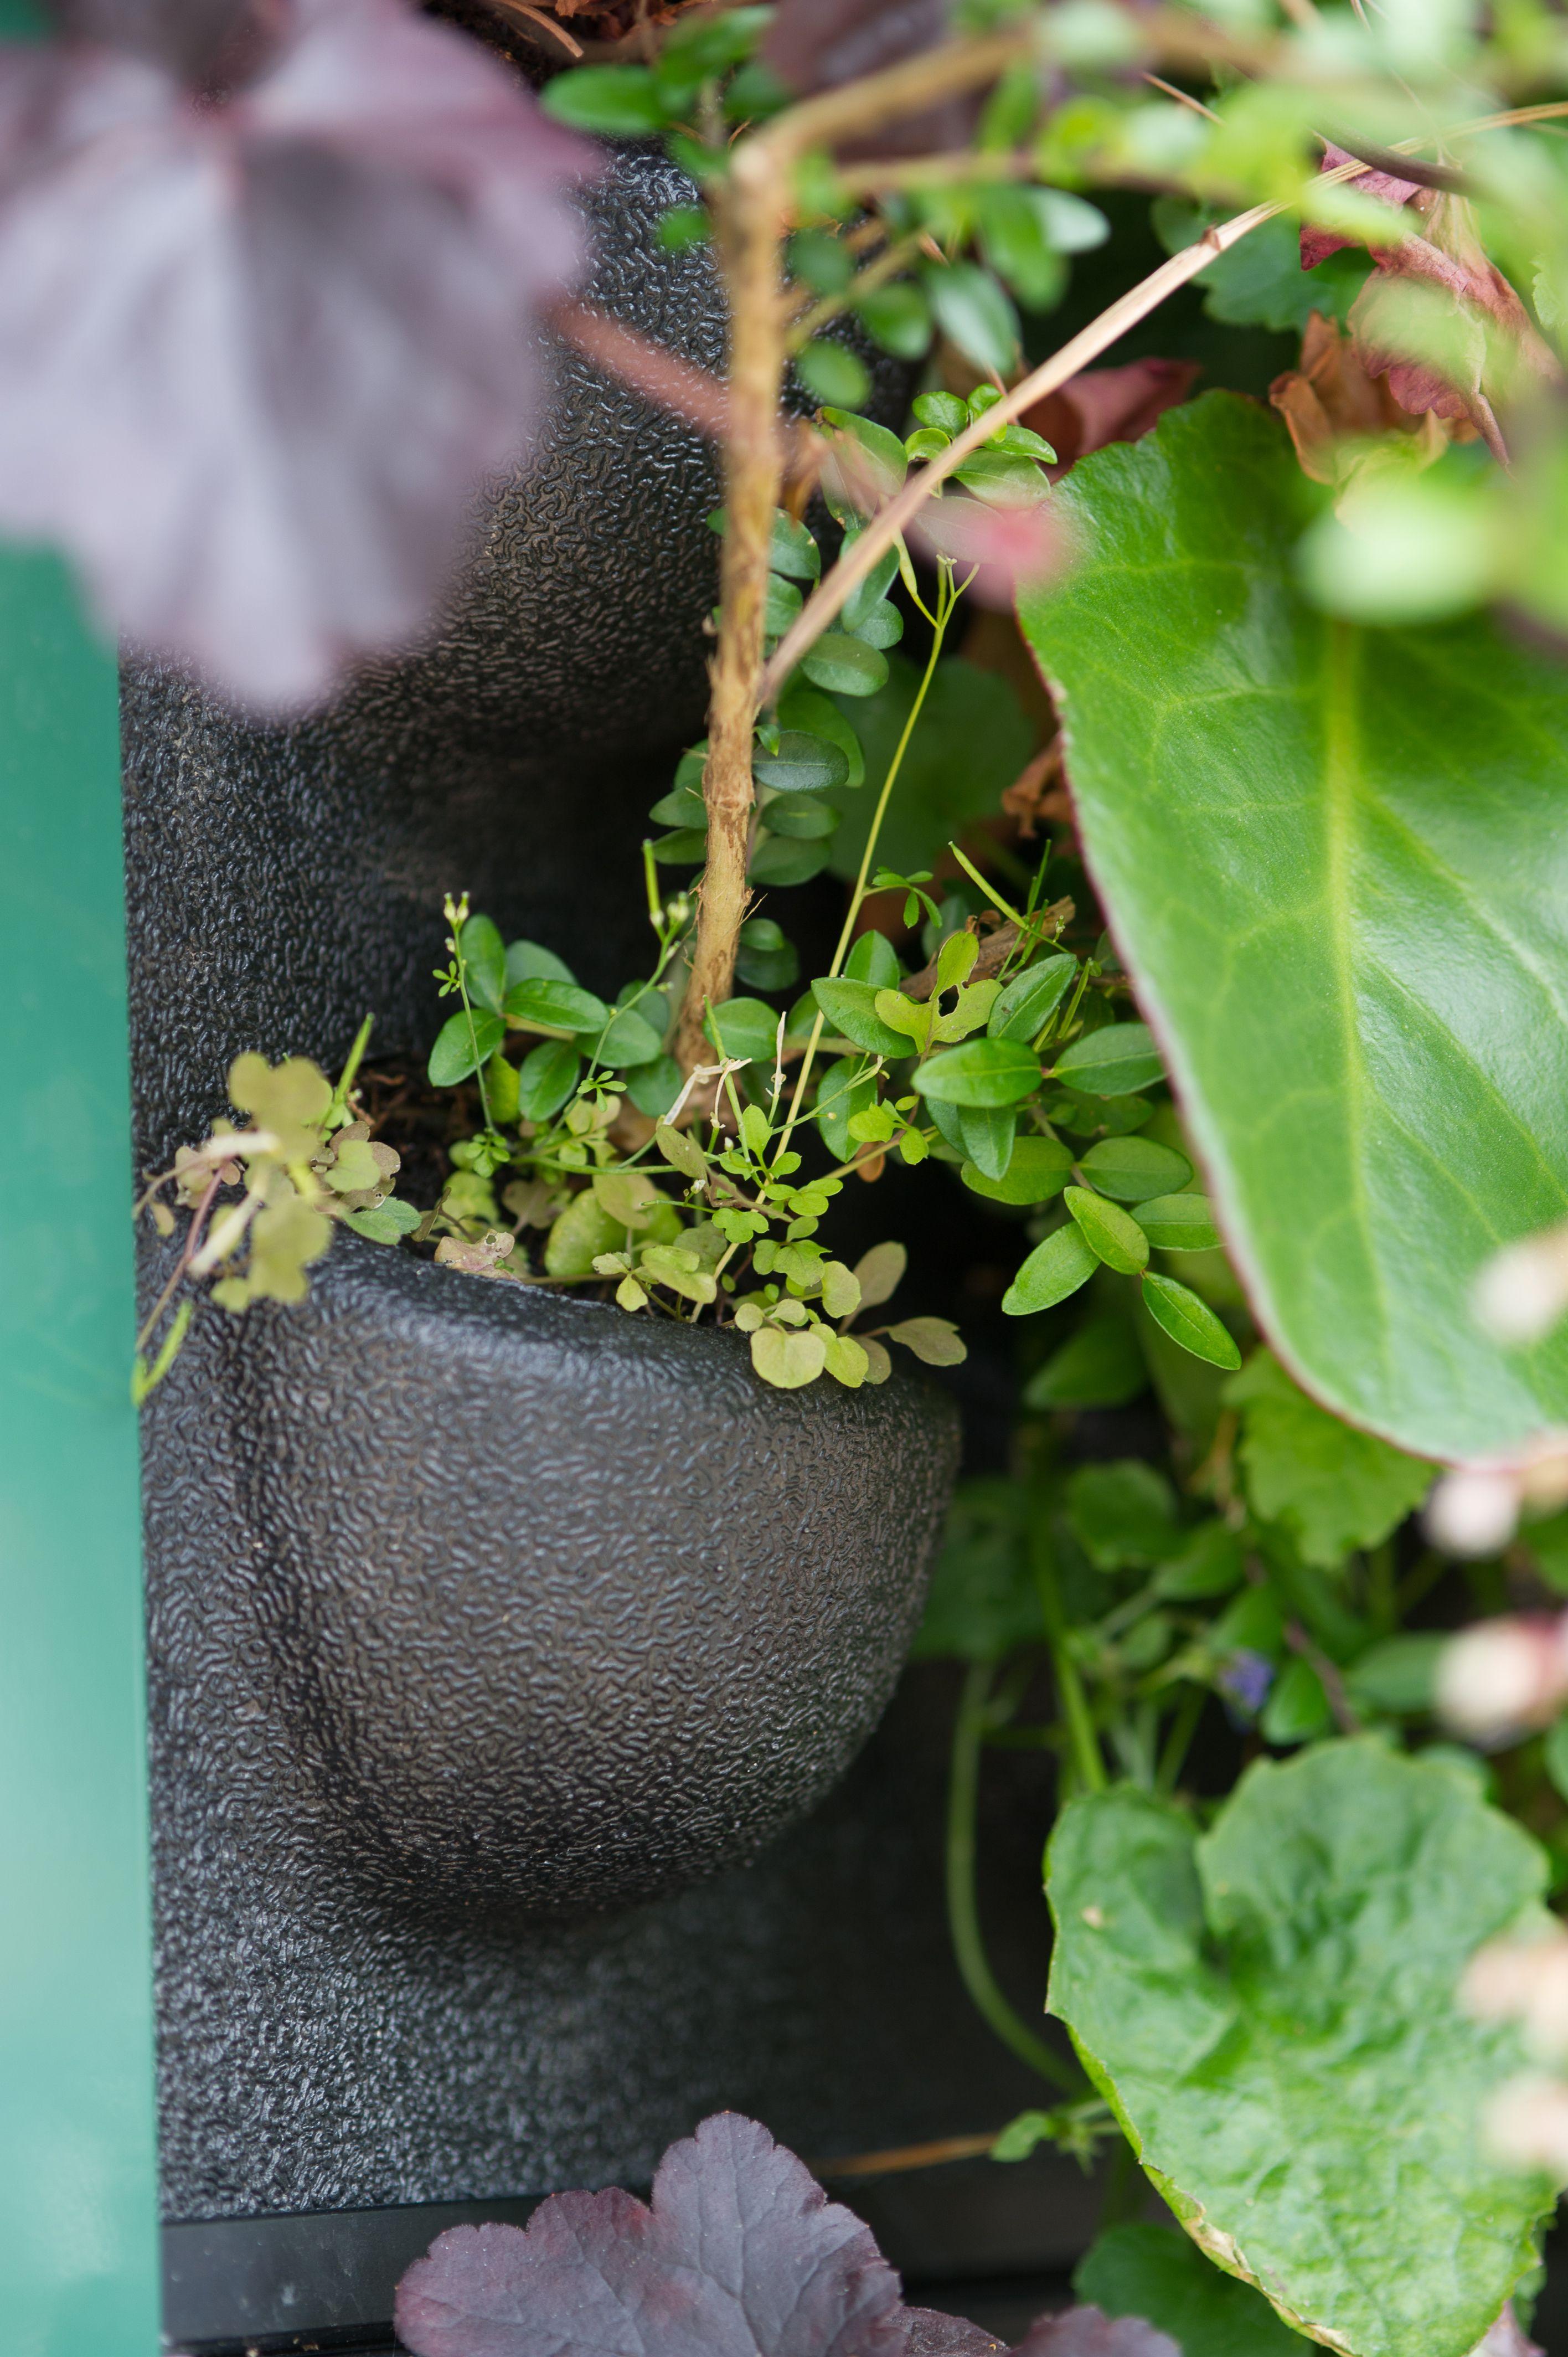 Mobilane LivePanel a sustainable vertical green wall Groene Muren Plant Muur Duurzaamheid